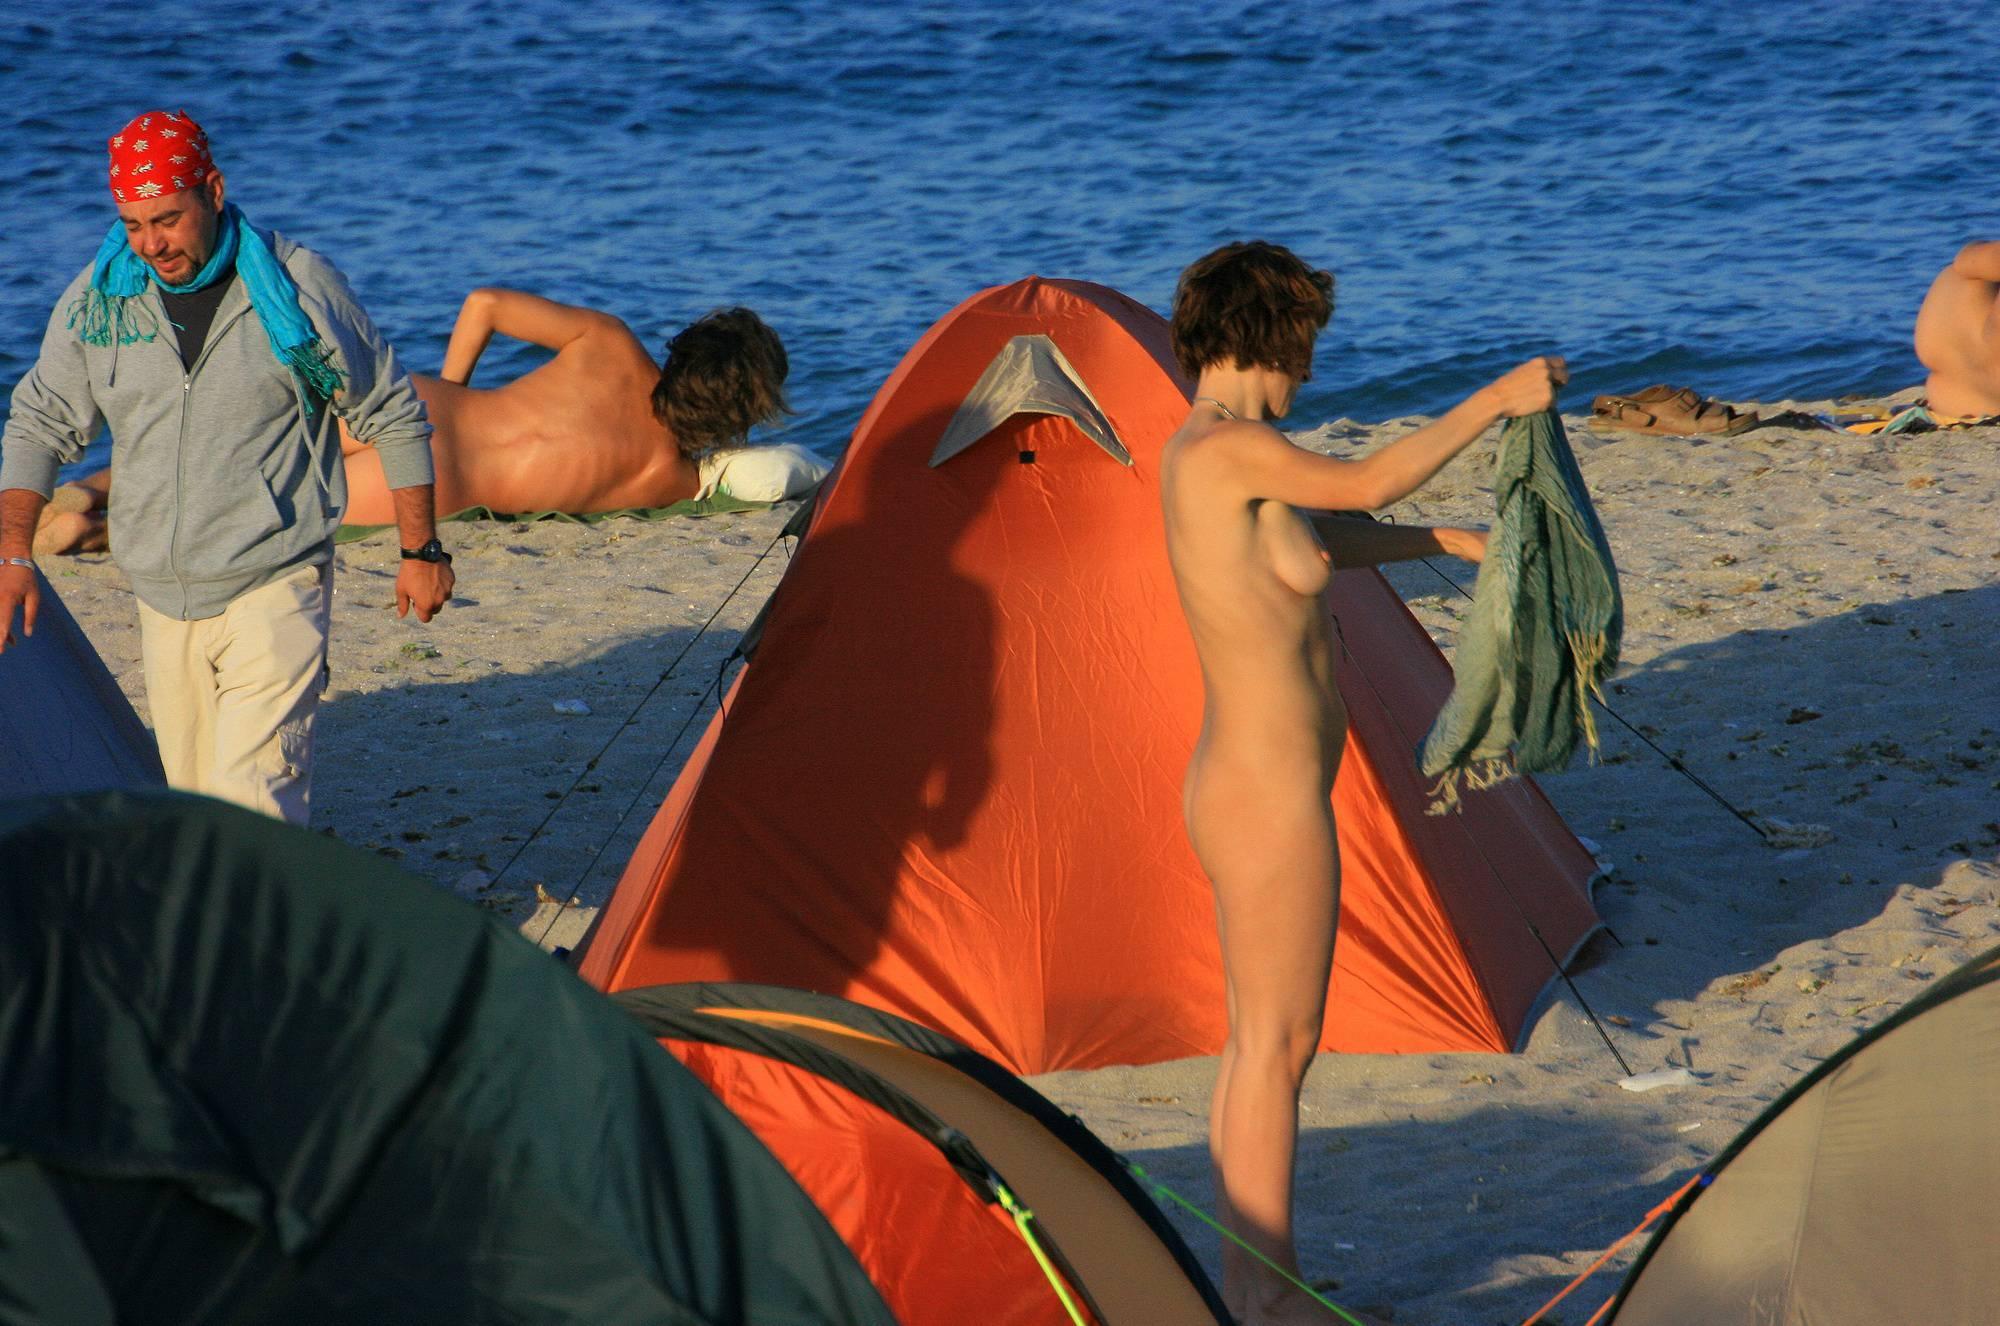 Nudist Pics Romanian Sunny Shore - 1